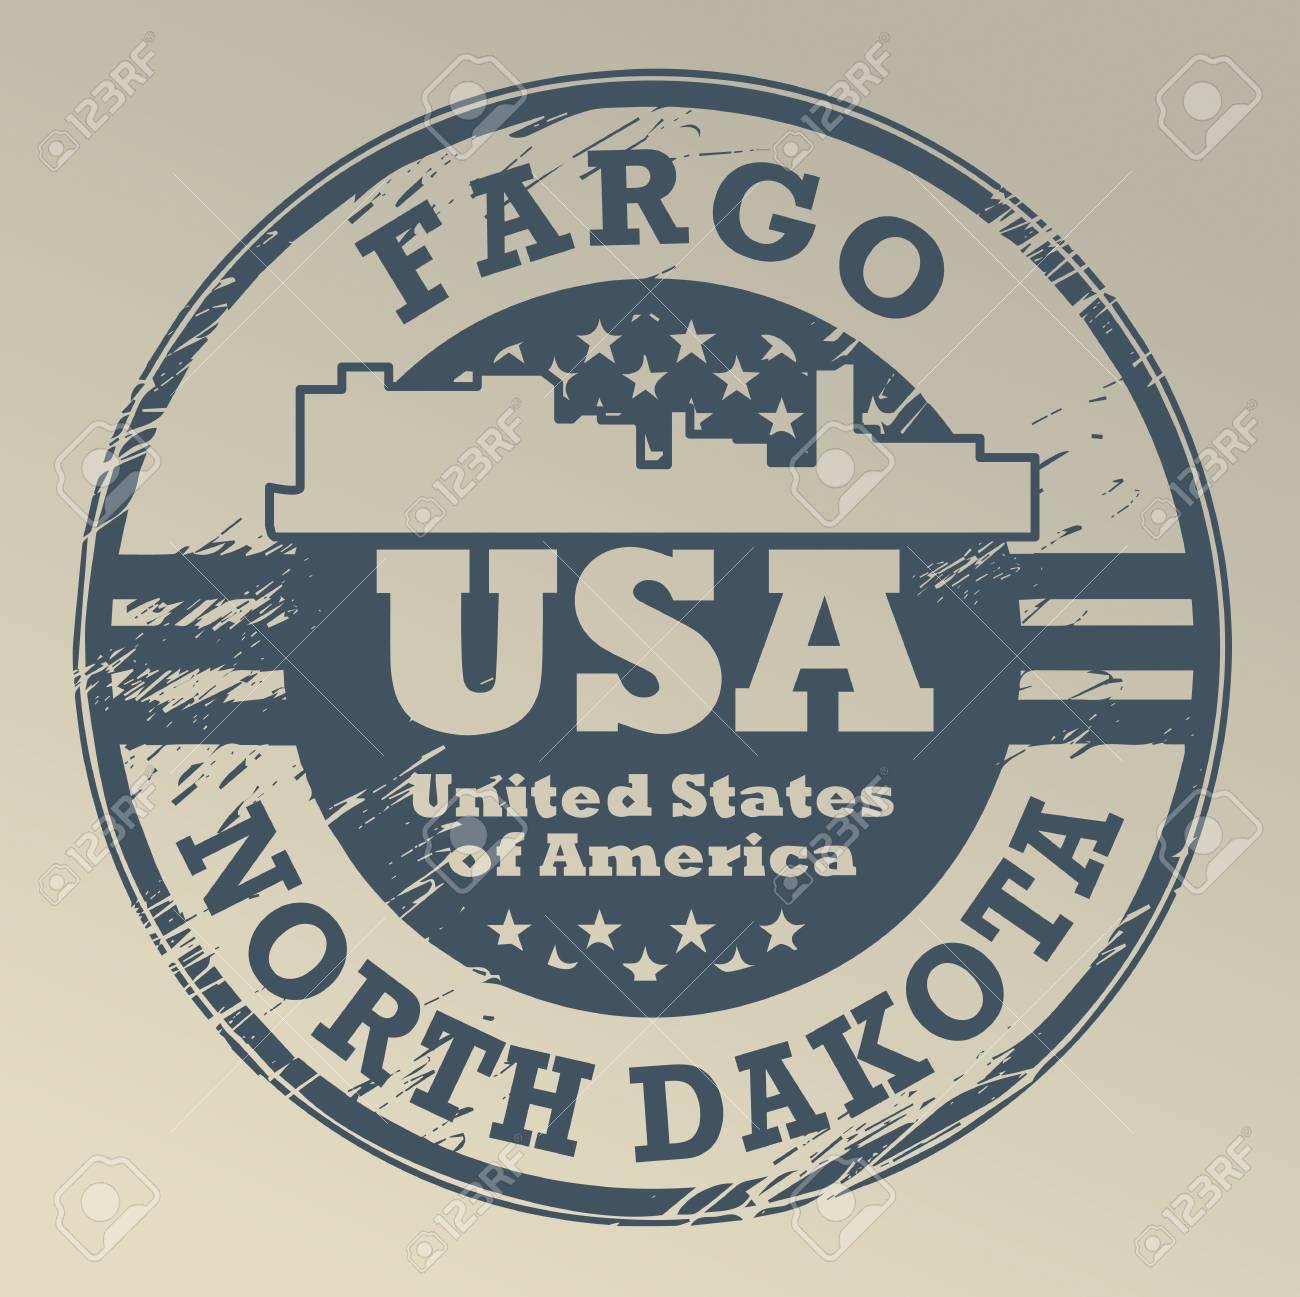 Grunge Rubber Stamp With Name Of North Dakota Fargo Stock Vector